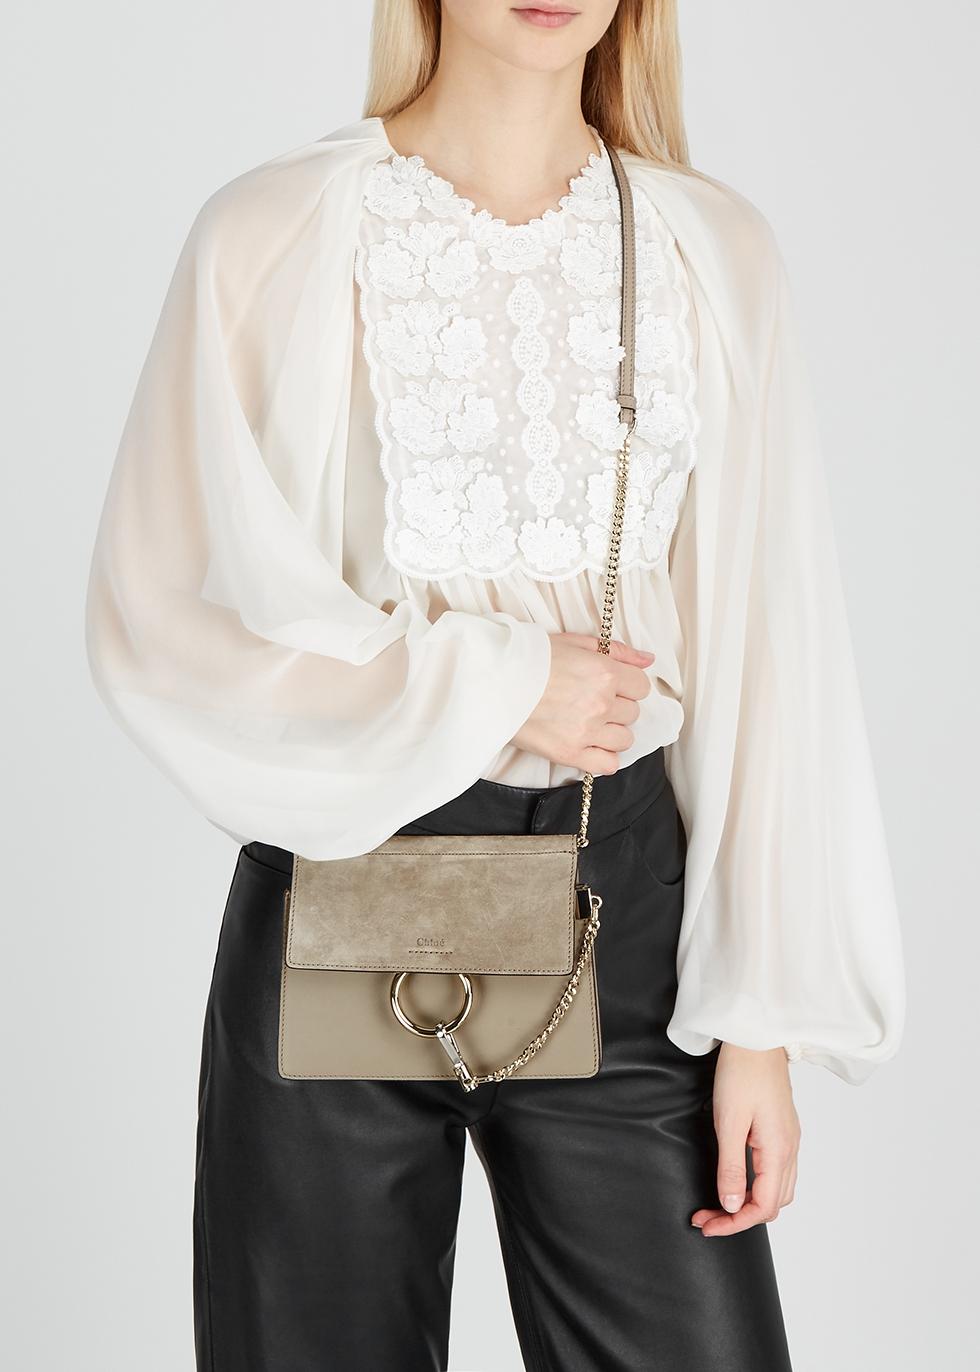 Chloé Faye mini leather shoulder bag Harvey Nichols